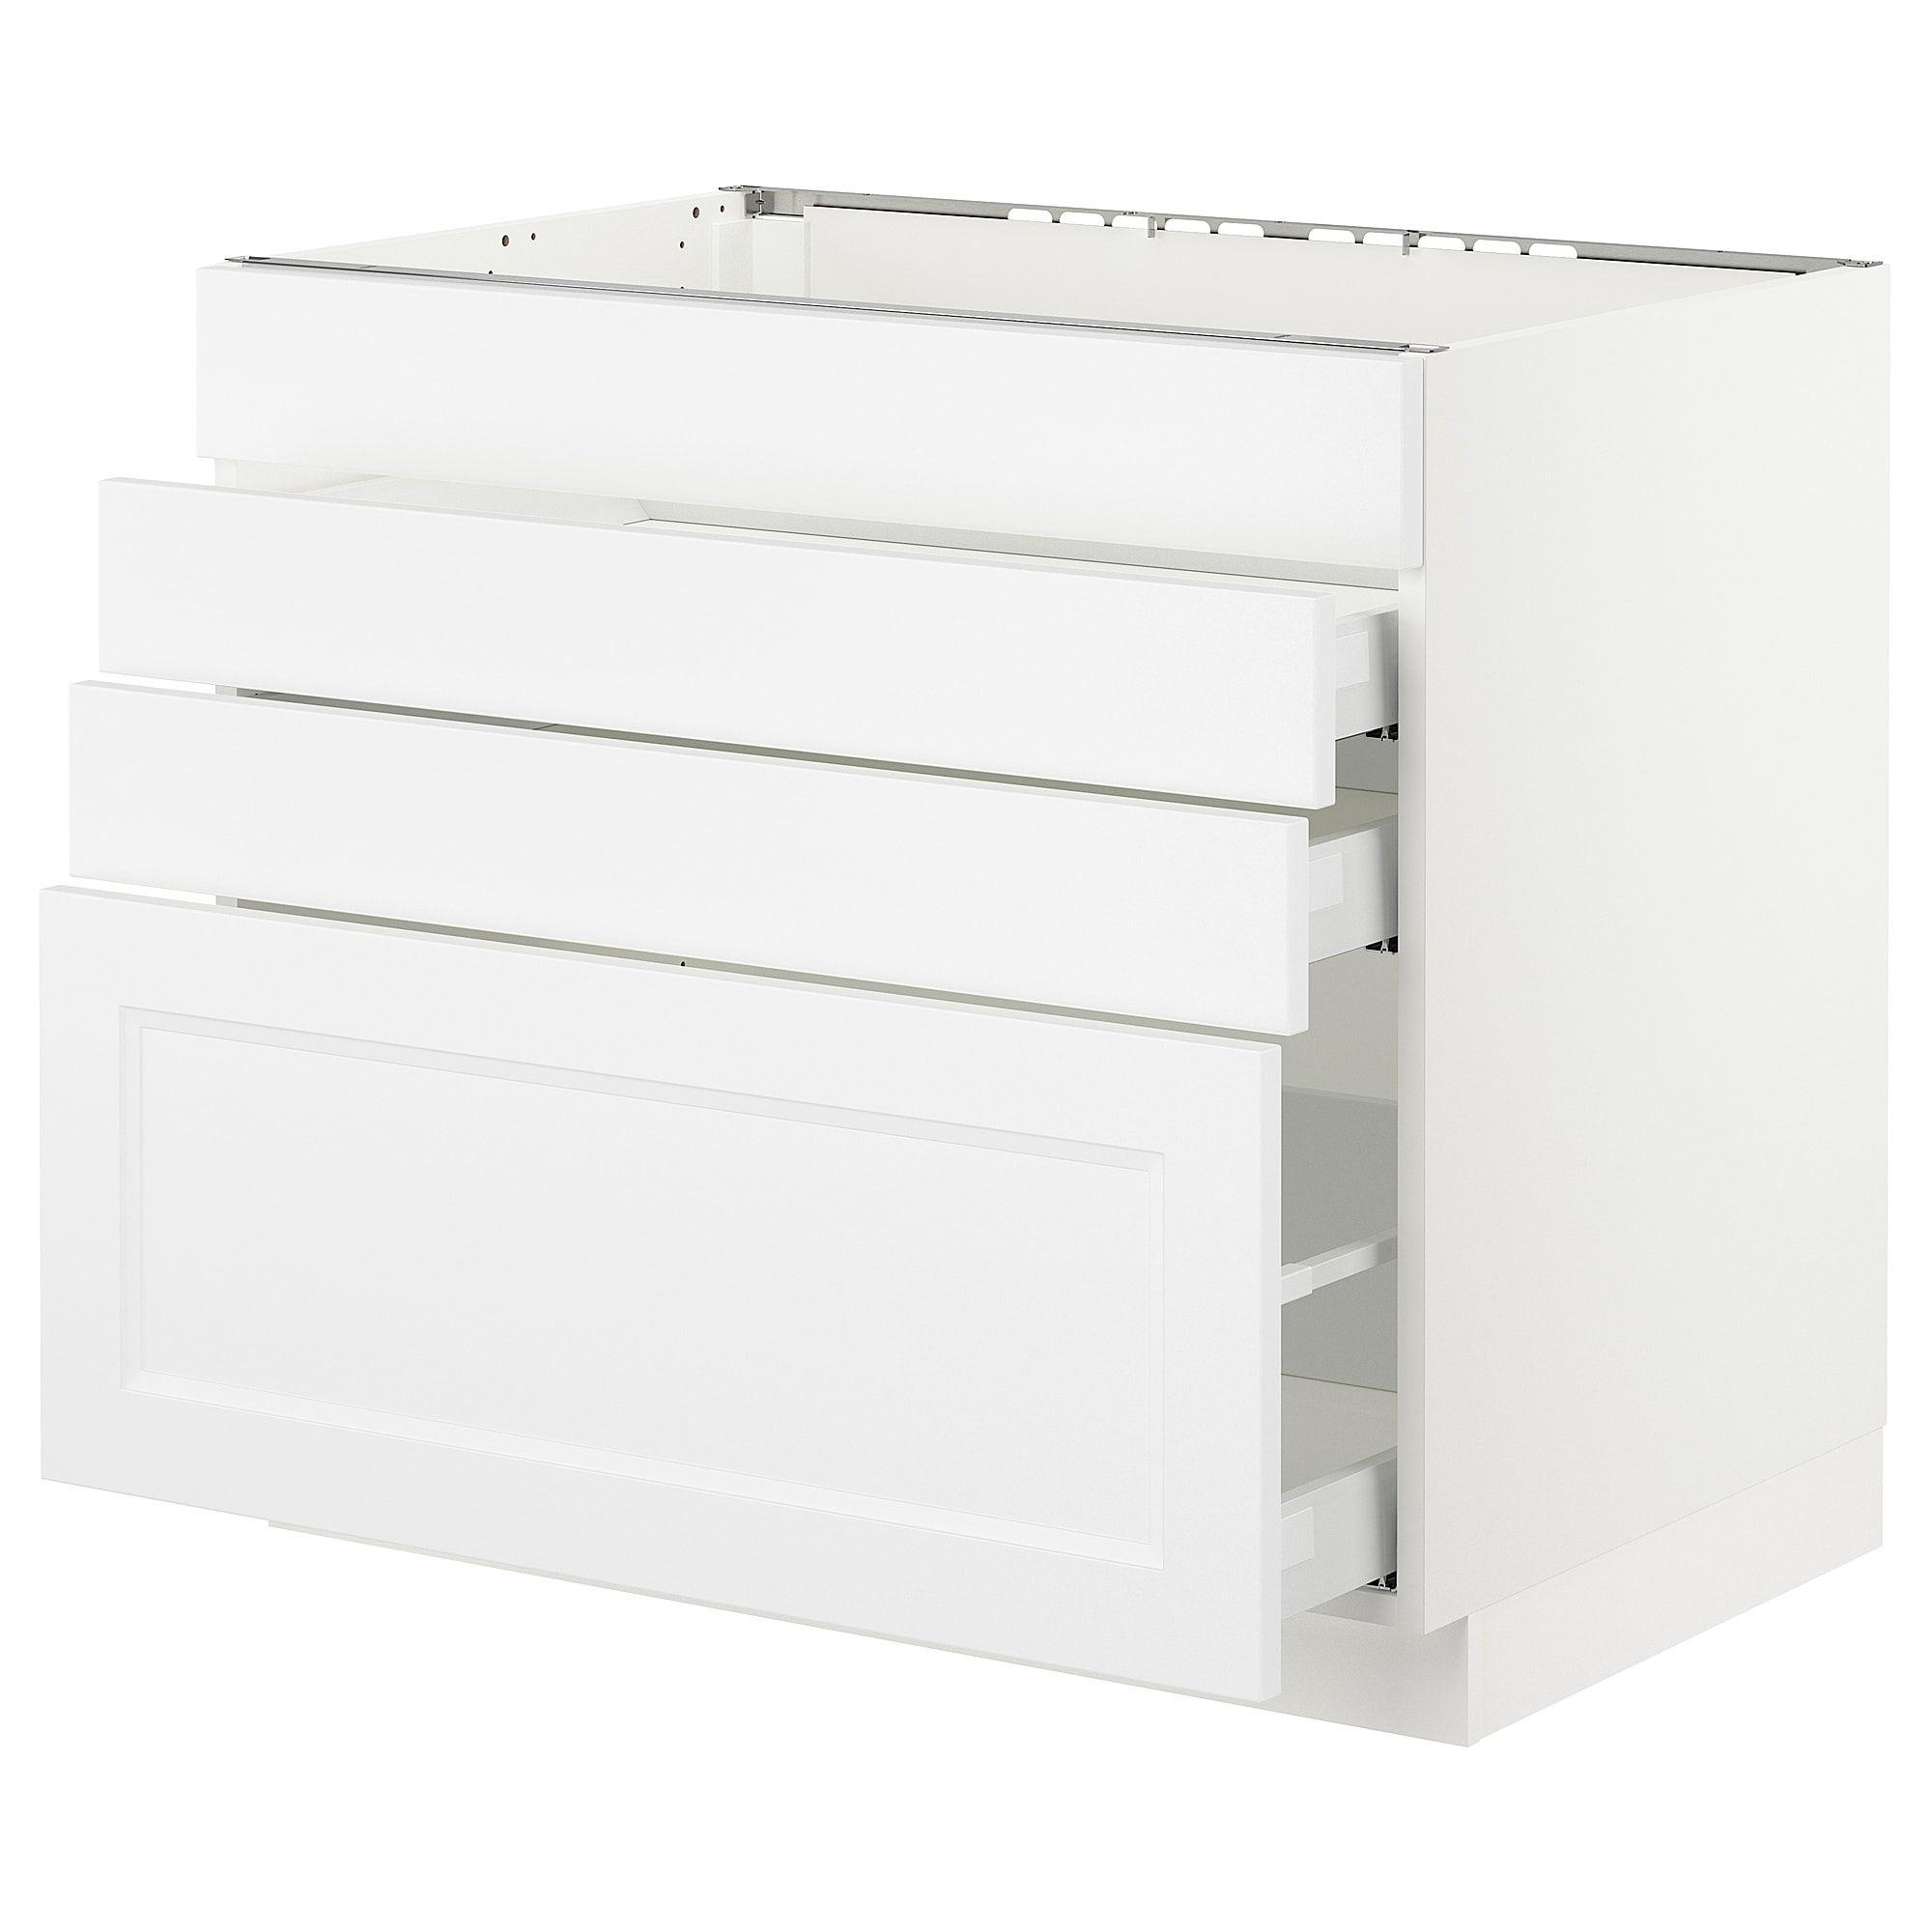 Ikea Sektion White Maximera Axstad Matt White Base Cabinet F Cooktop W 3 Drawers Base Cabinets Wardrobe Cabinets Ikea